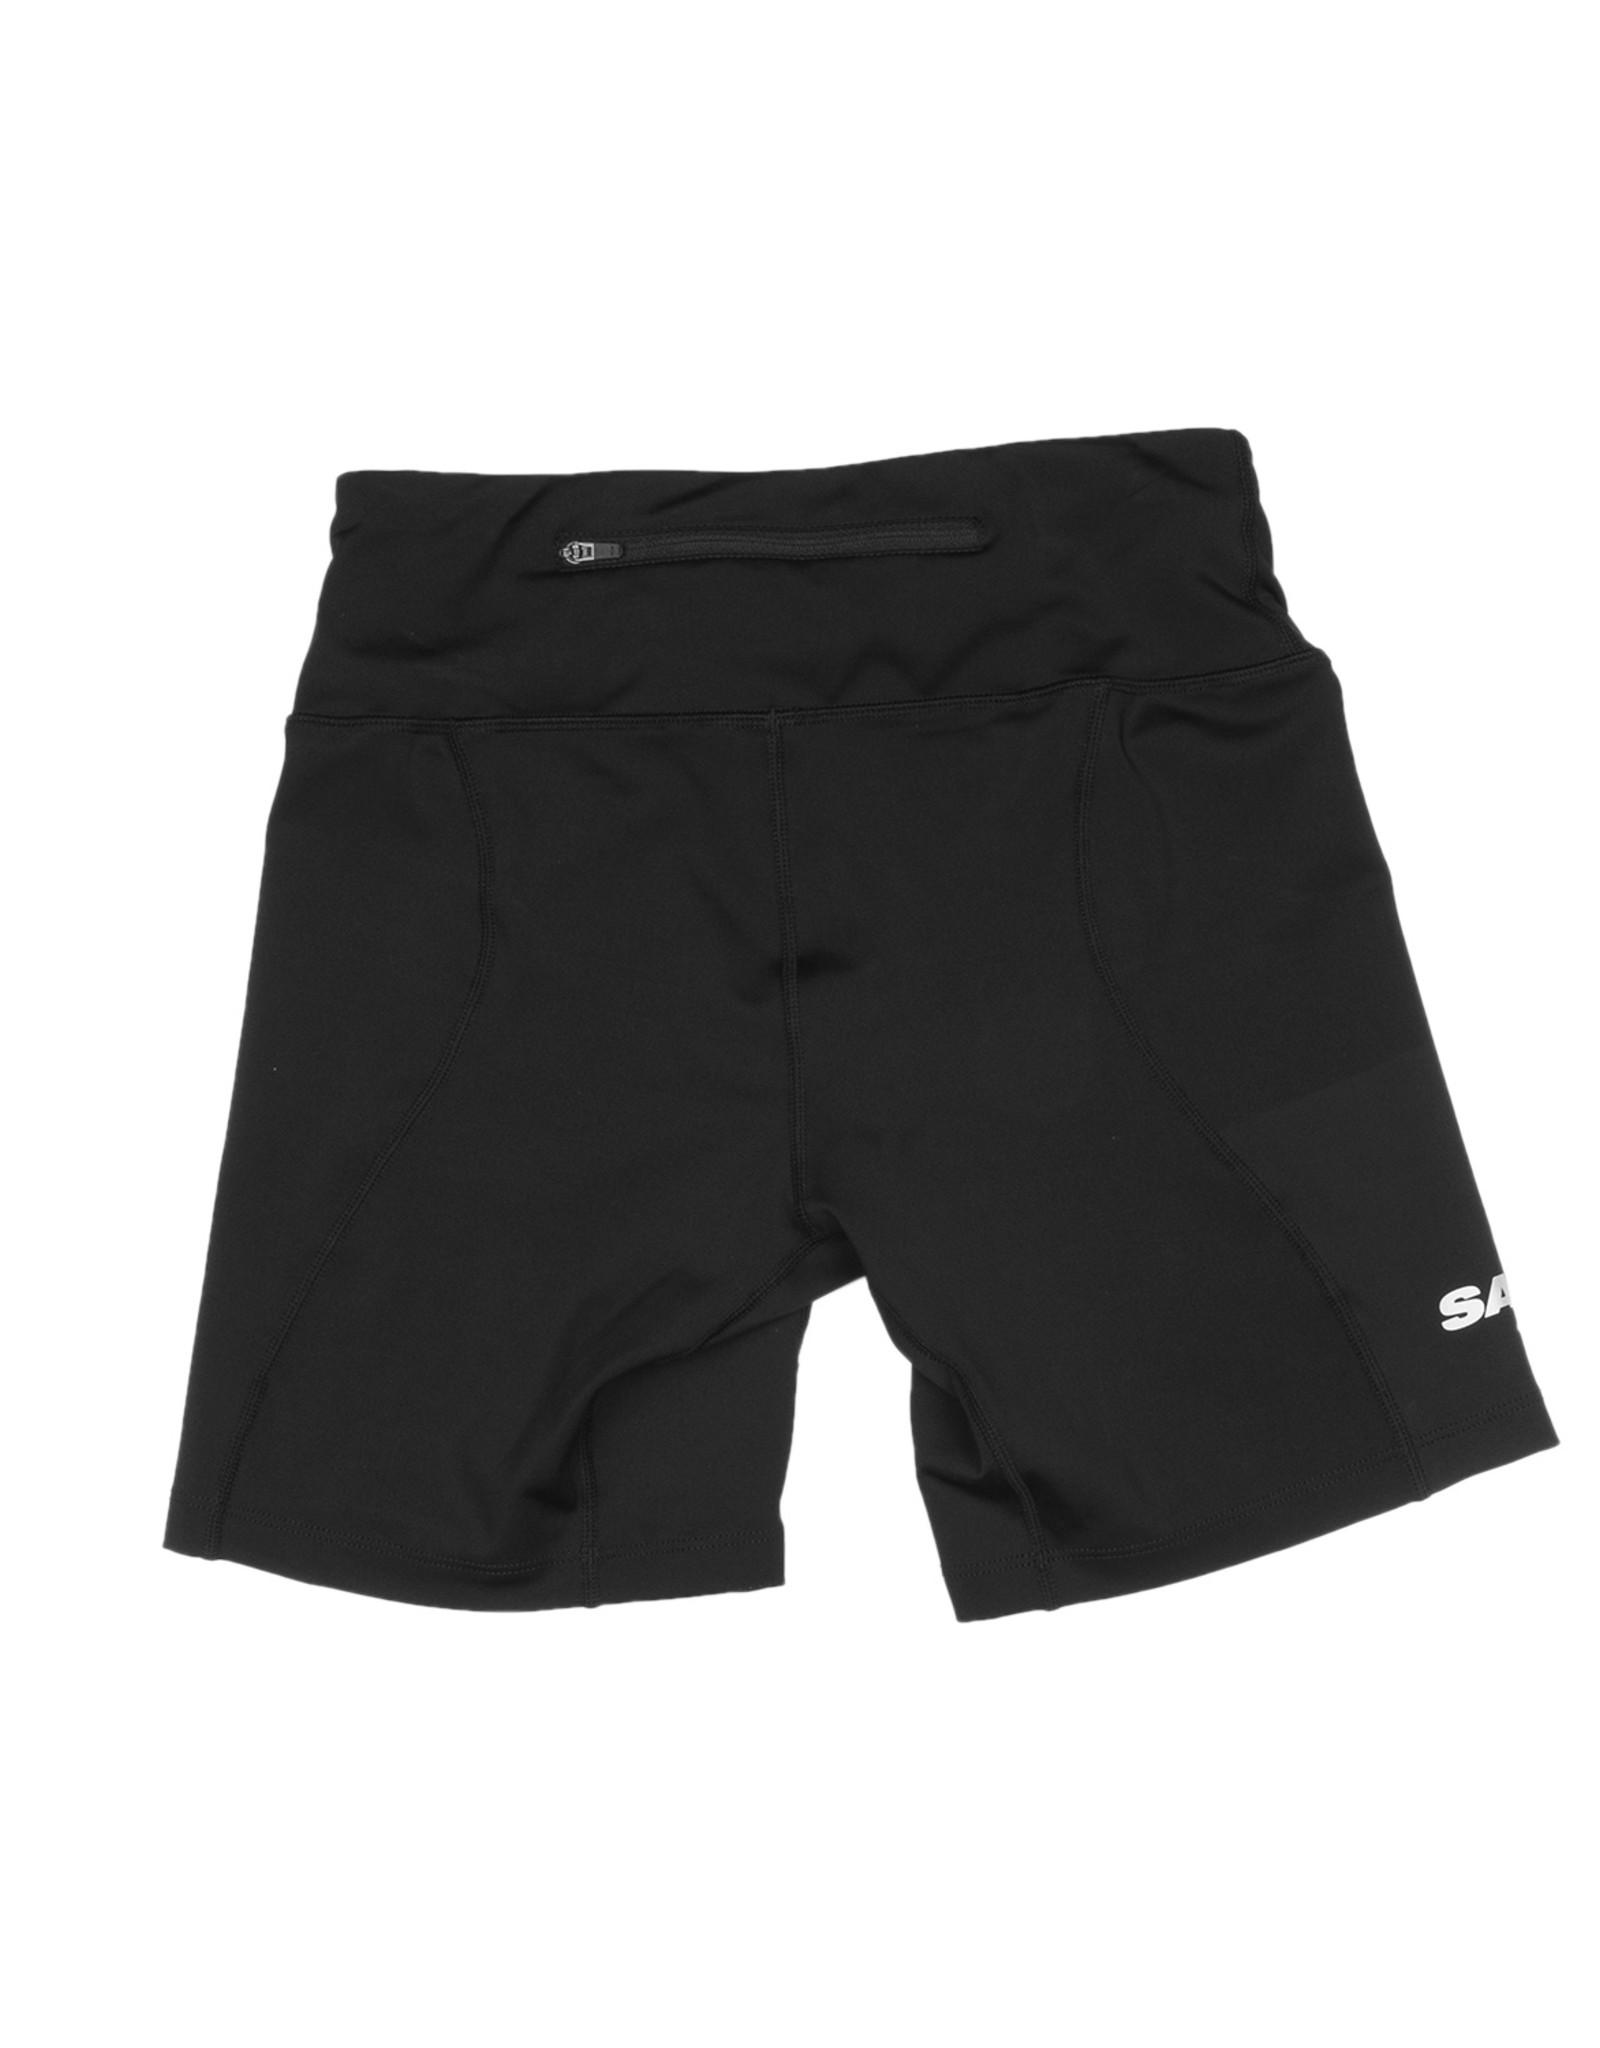 Saysky Short Eco combat tightshort dames (CGRST01)